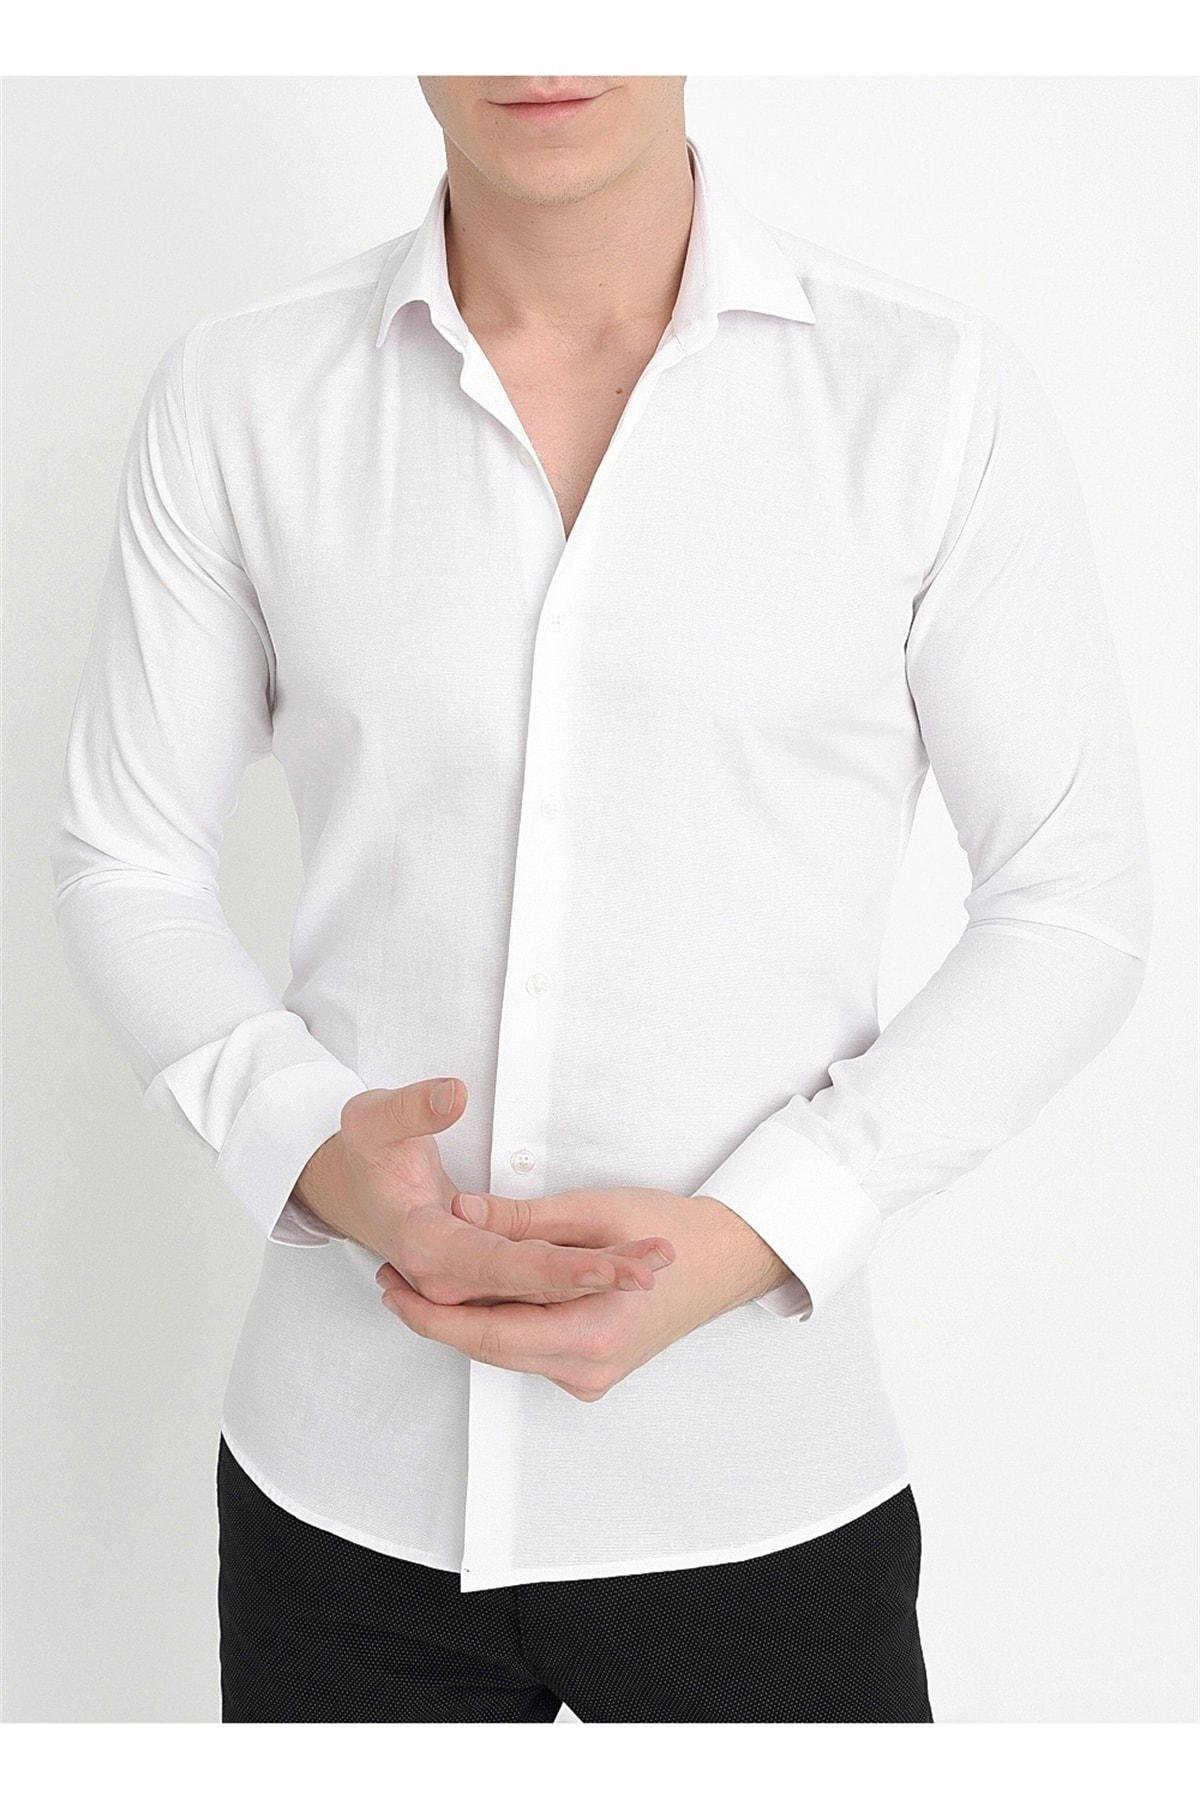 Efor Gk 568 Slim Fit Beyaz Klasik Gömlek 1